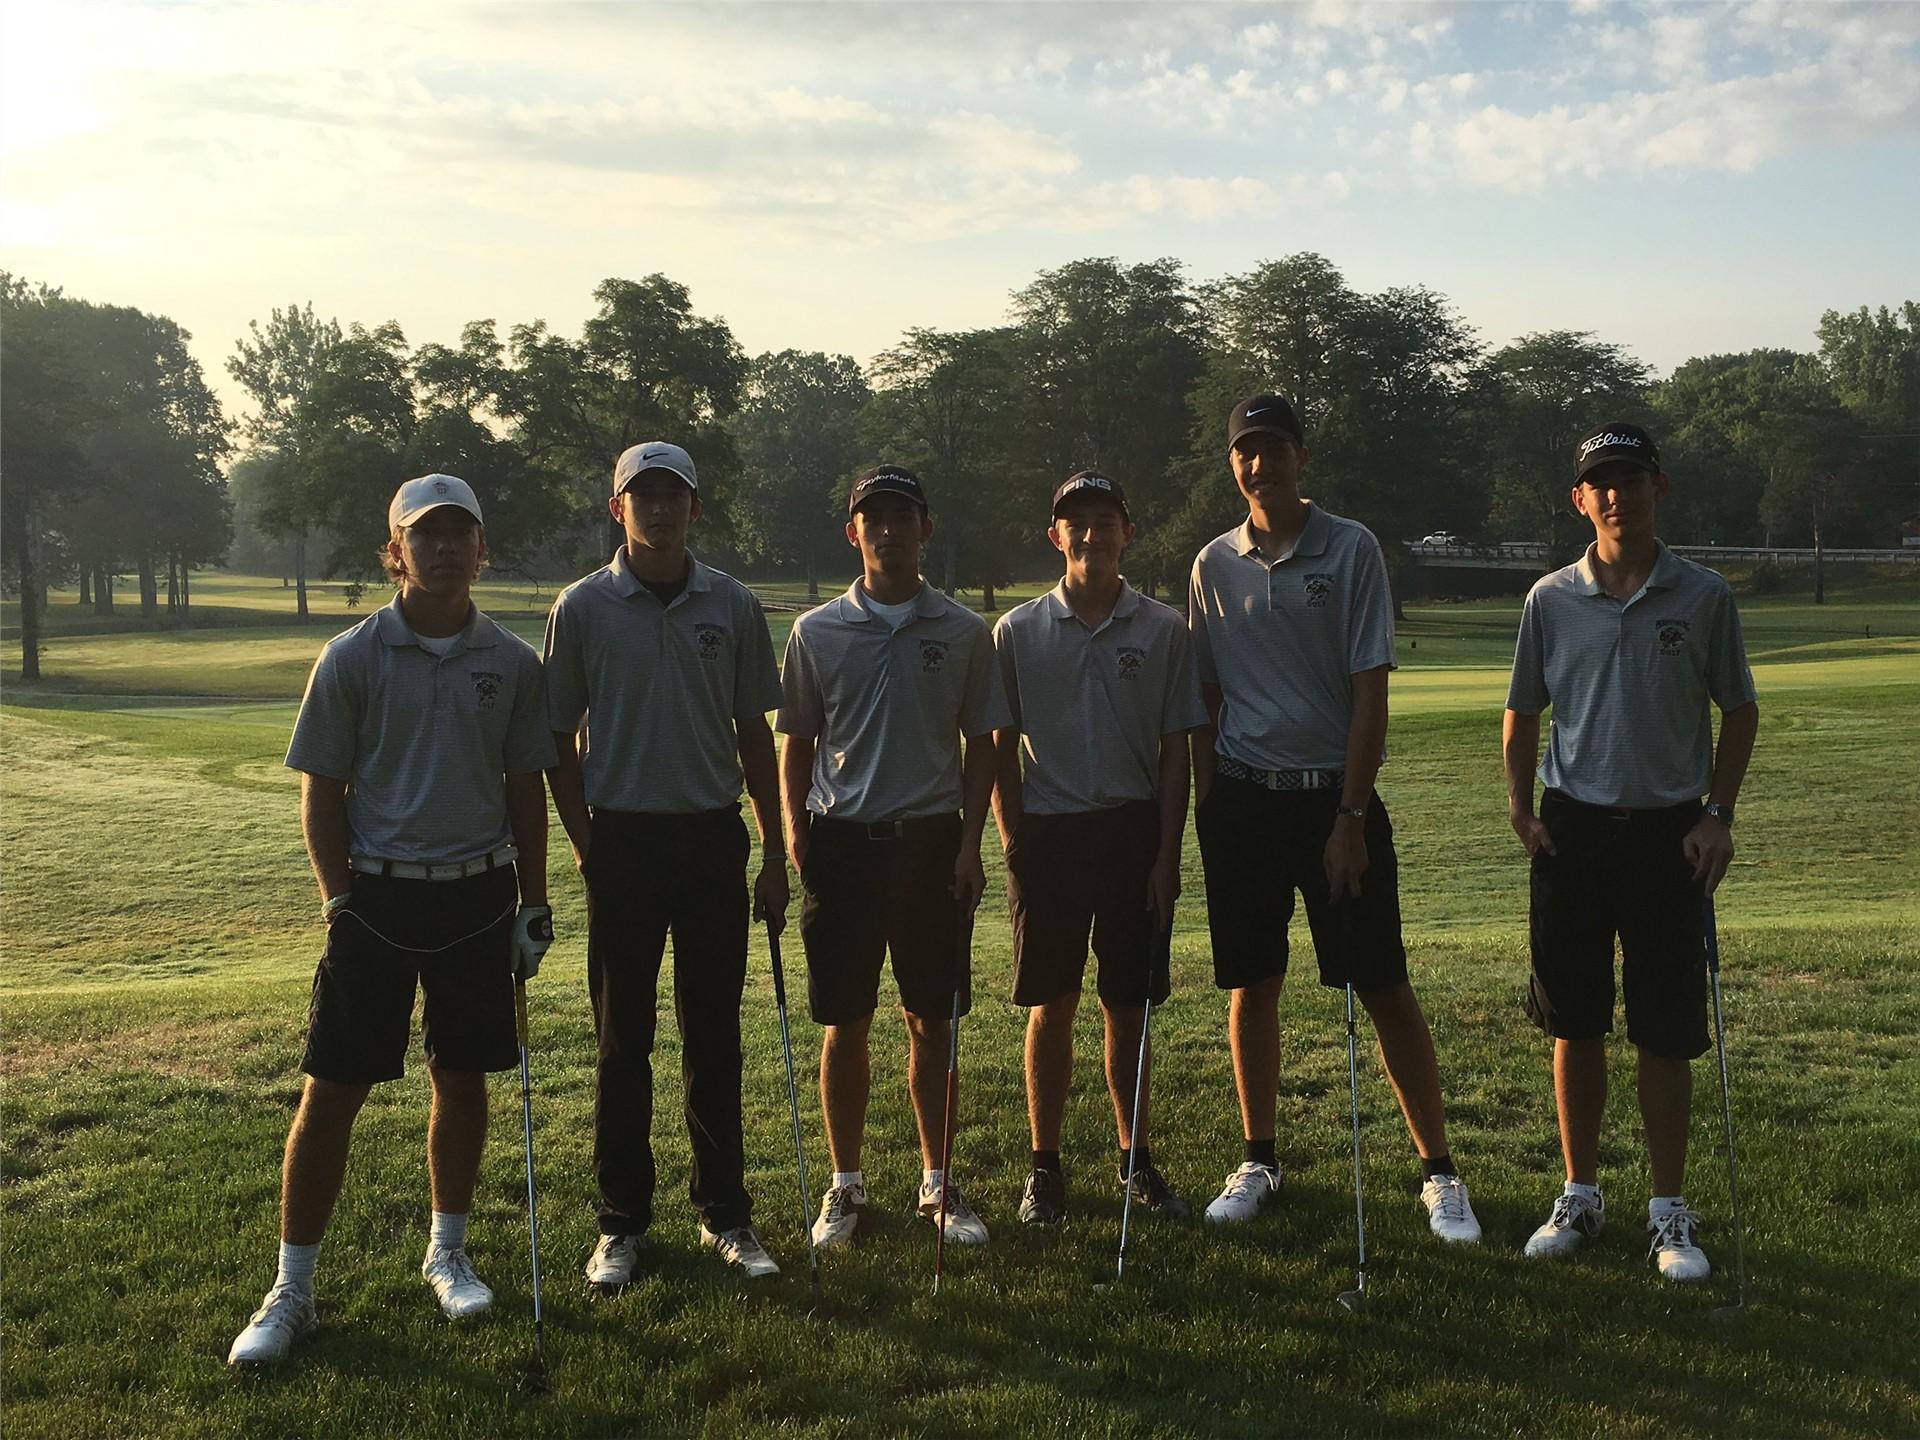 PHS boys golf team posing before the match